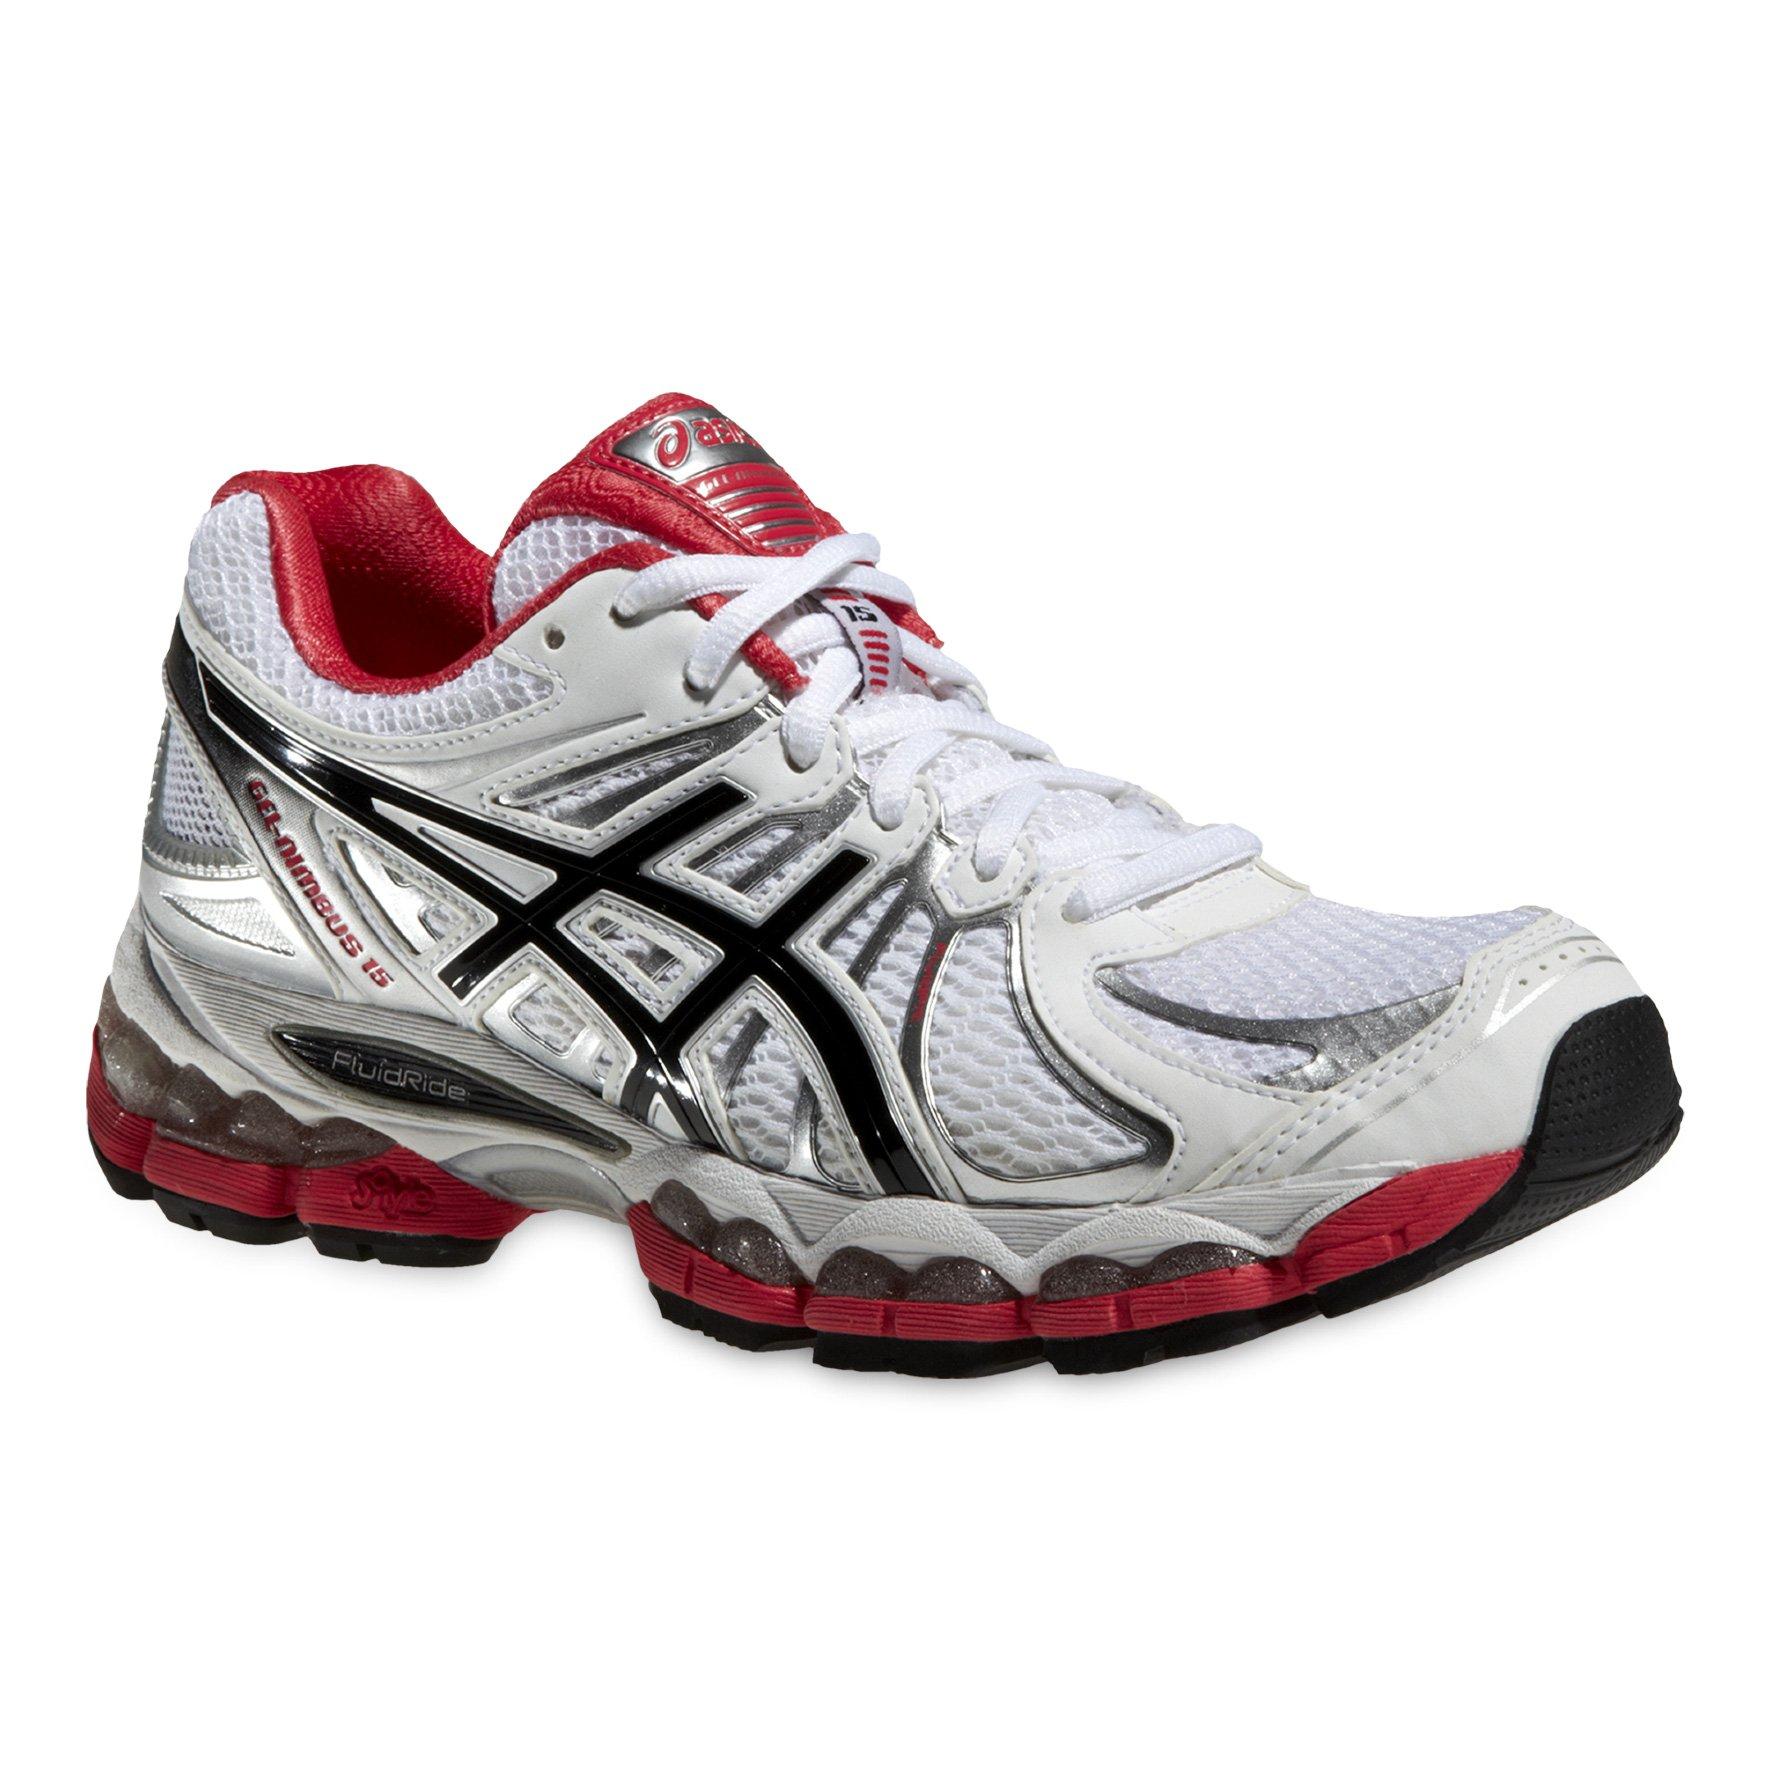 ASICS Gel Nimbus 14 Running Shoes WMS (Shoe Bonus): Amazon.es: Deportes y aire libre